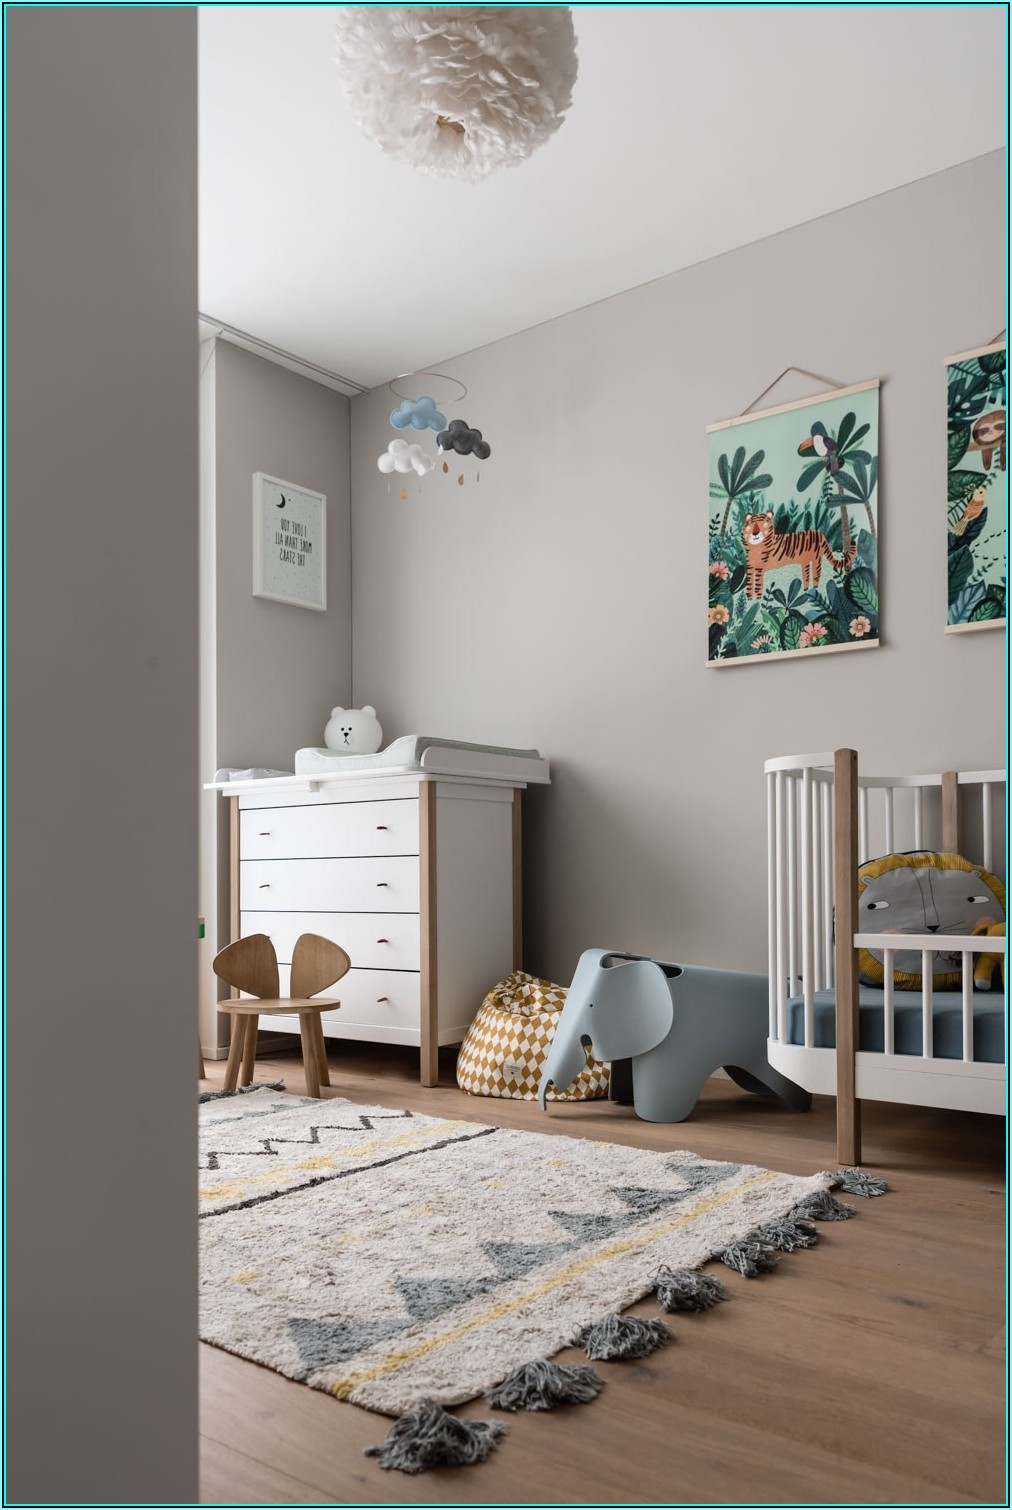 Kinderzimmer 10 5 Qm